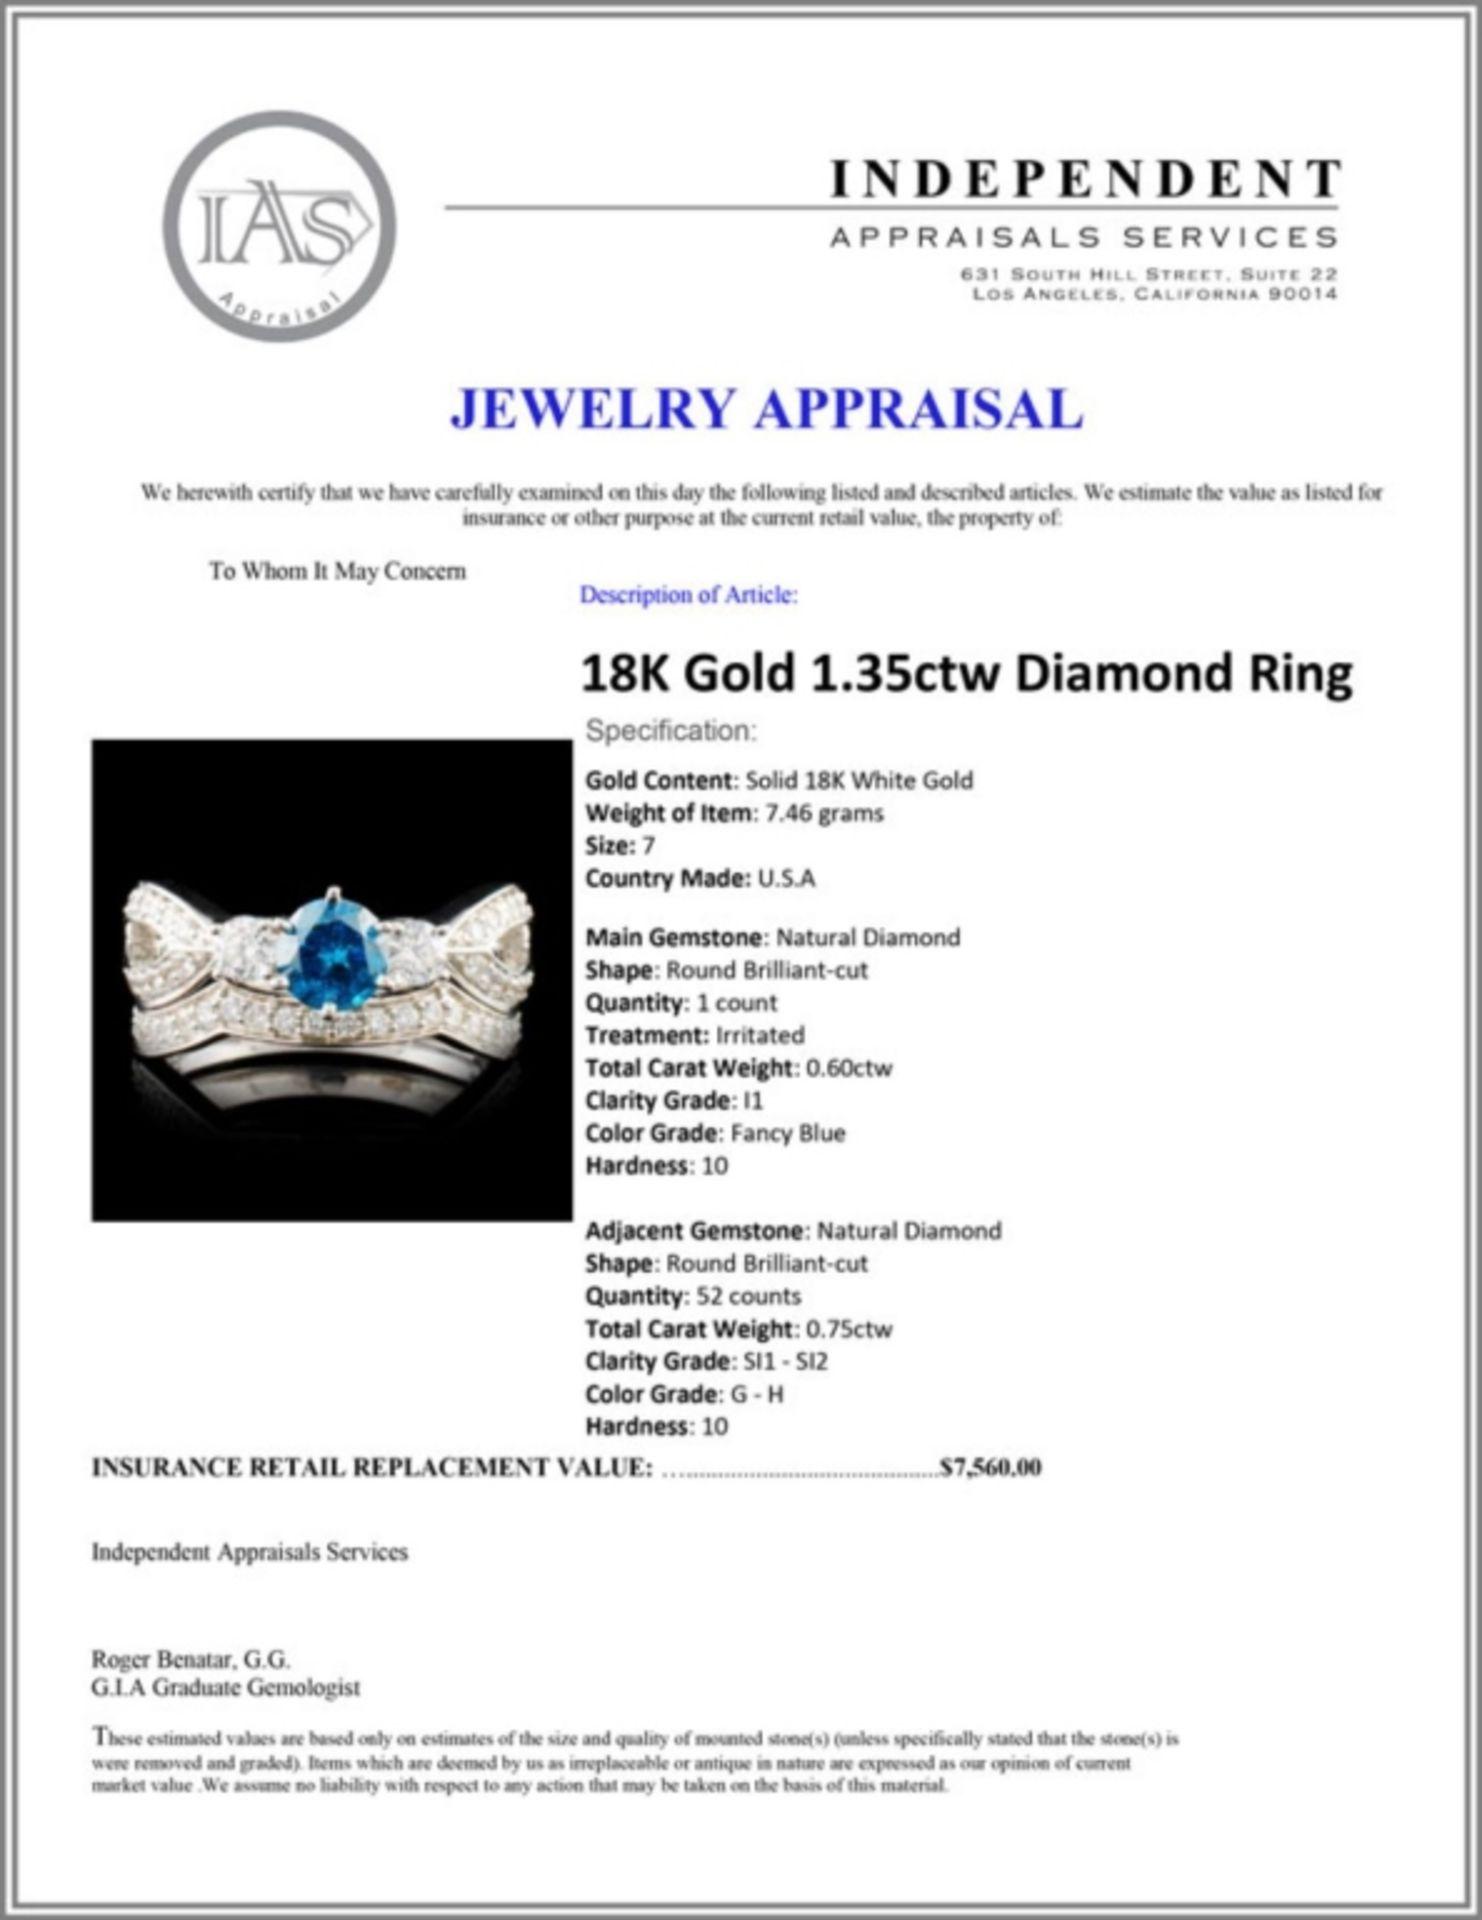 18K Gold 1.35ctw Diamond Ring - Image 5 of 5